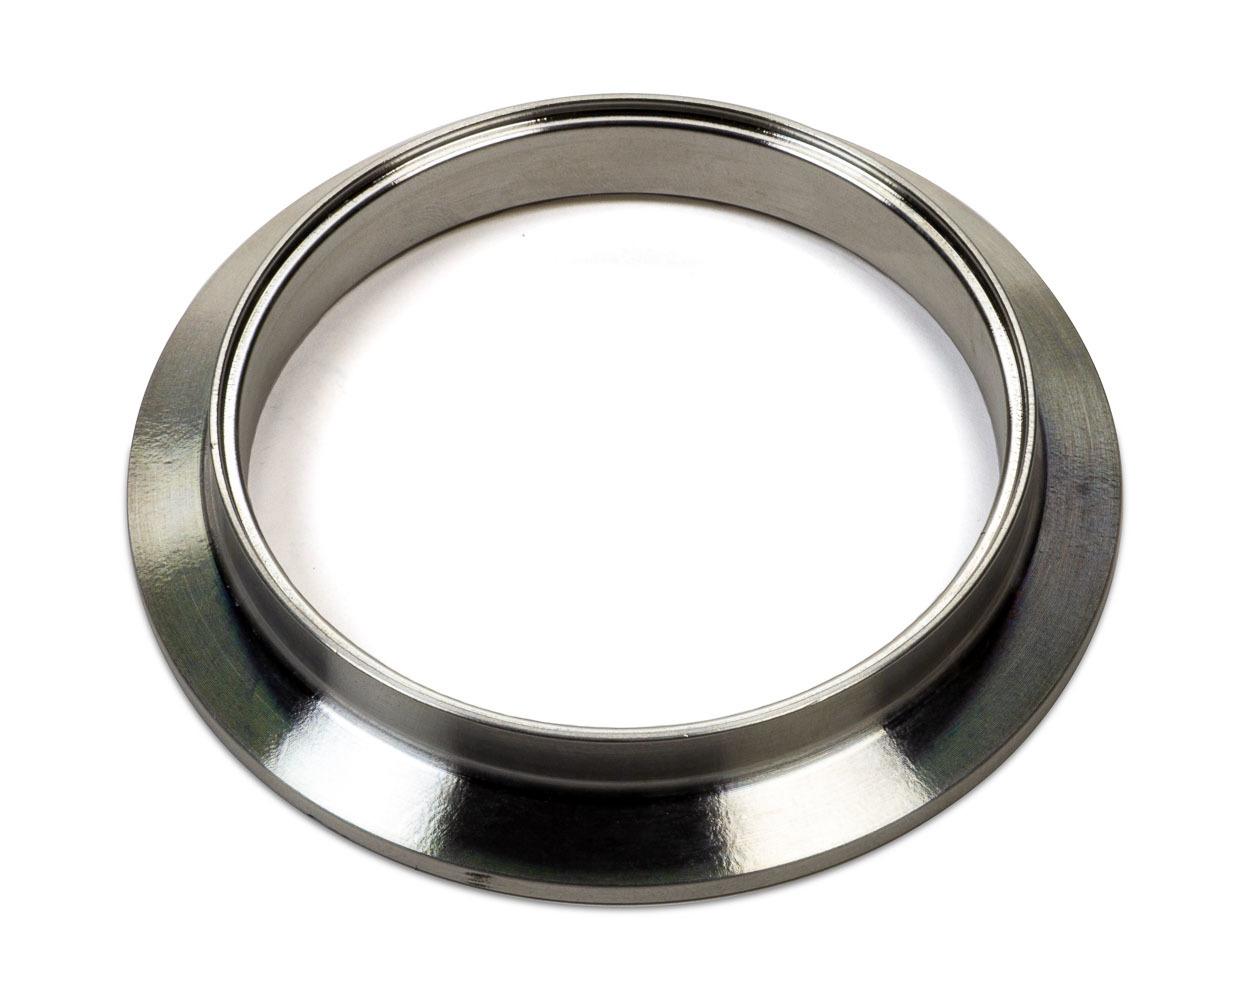 Vibrant Performance Stainless Steel V-Band F lange for 3in O.D.